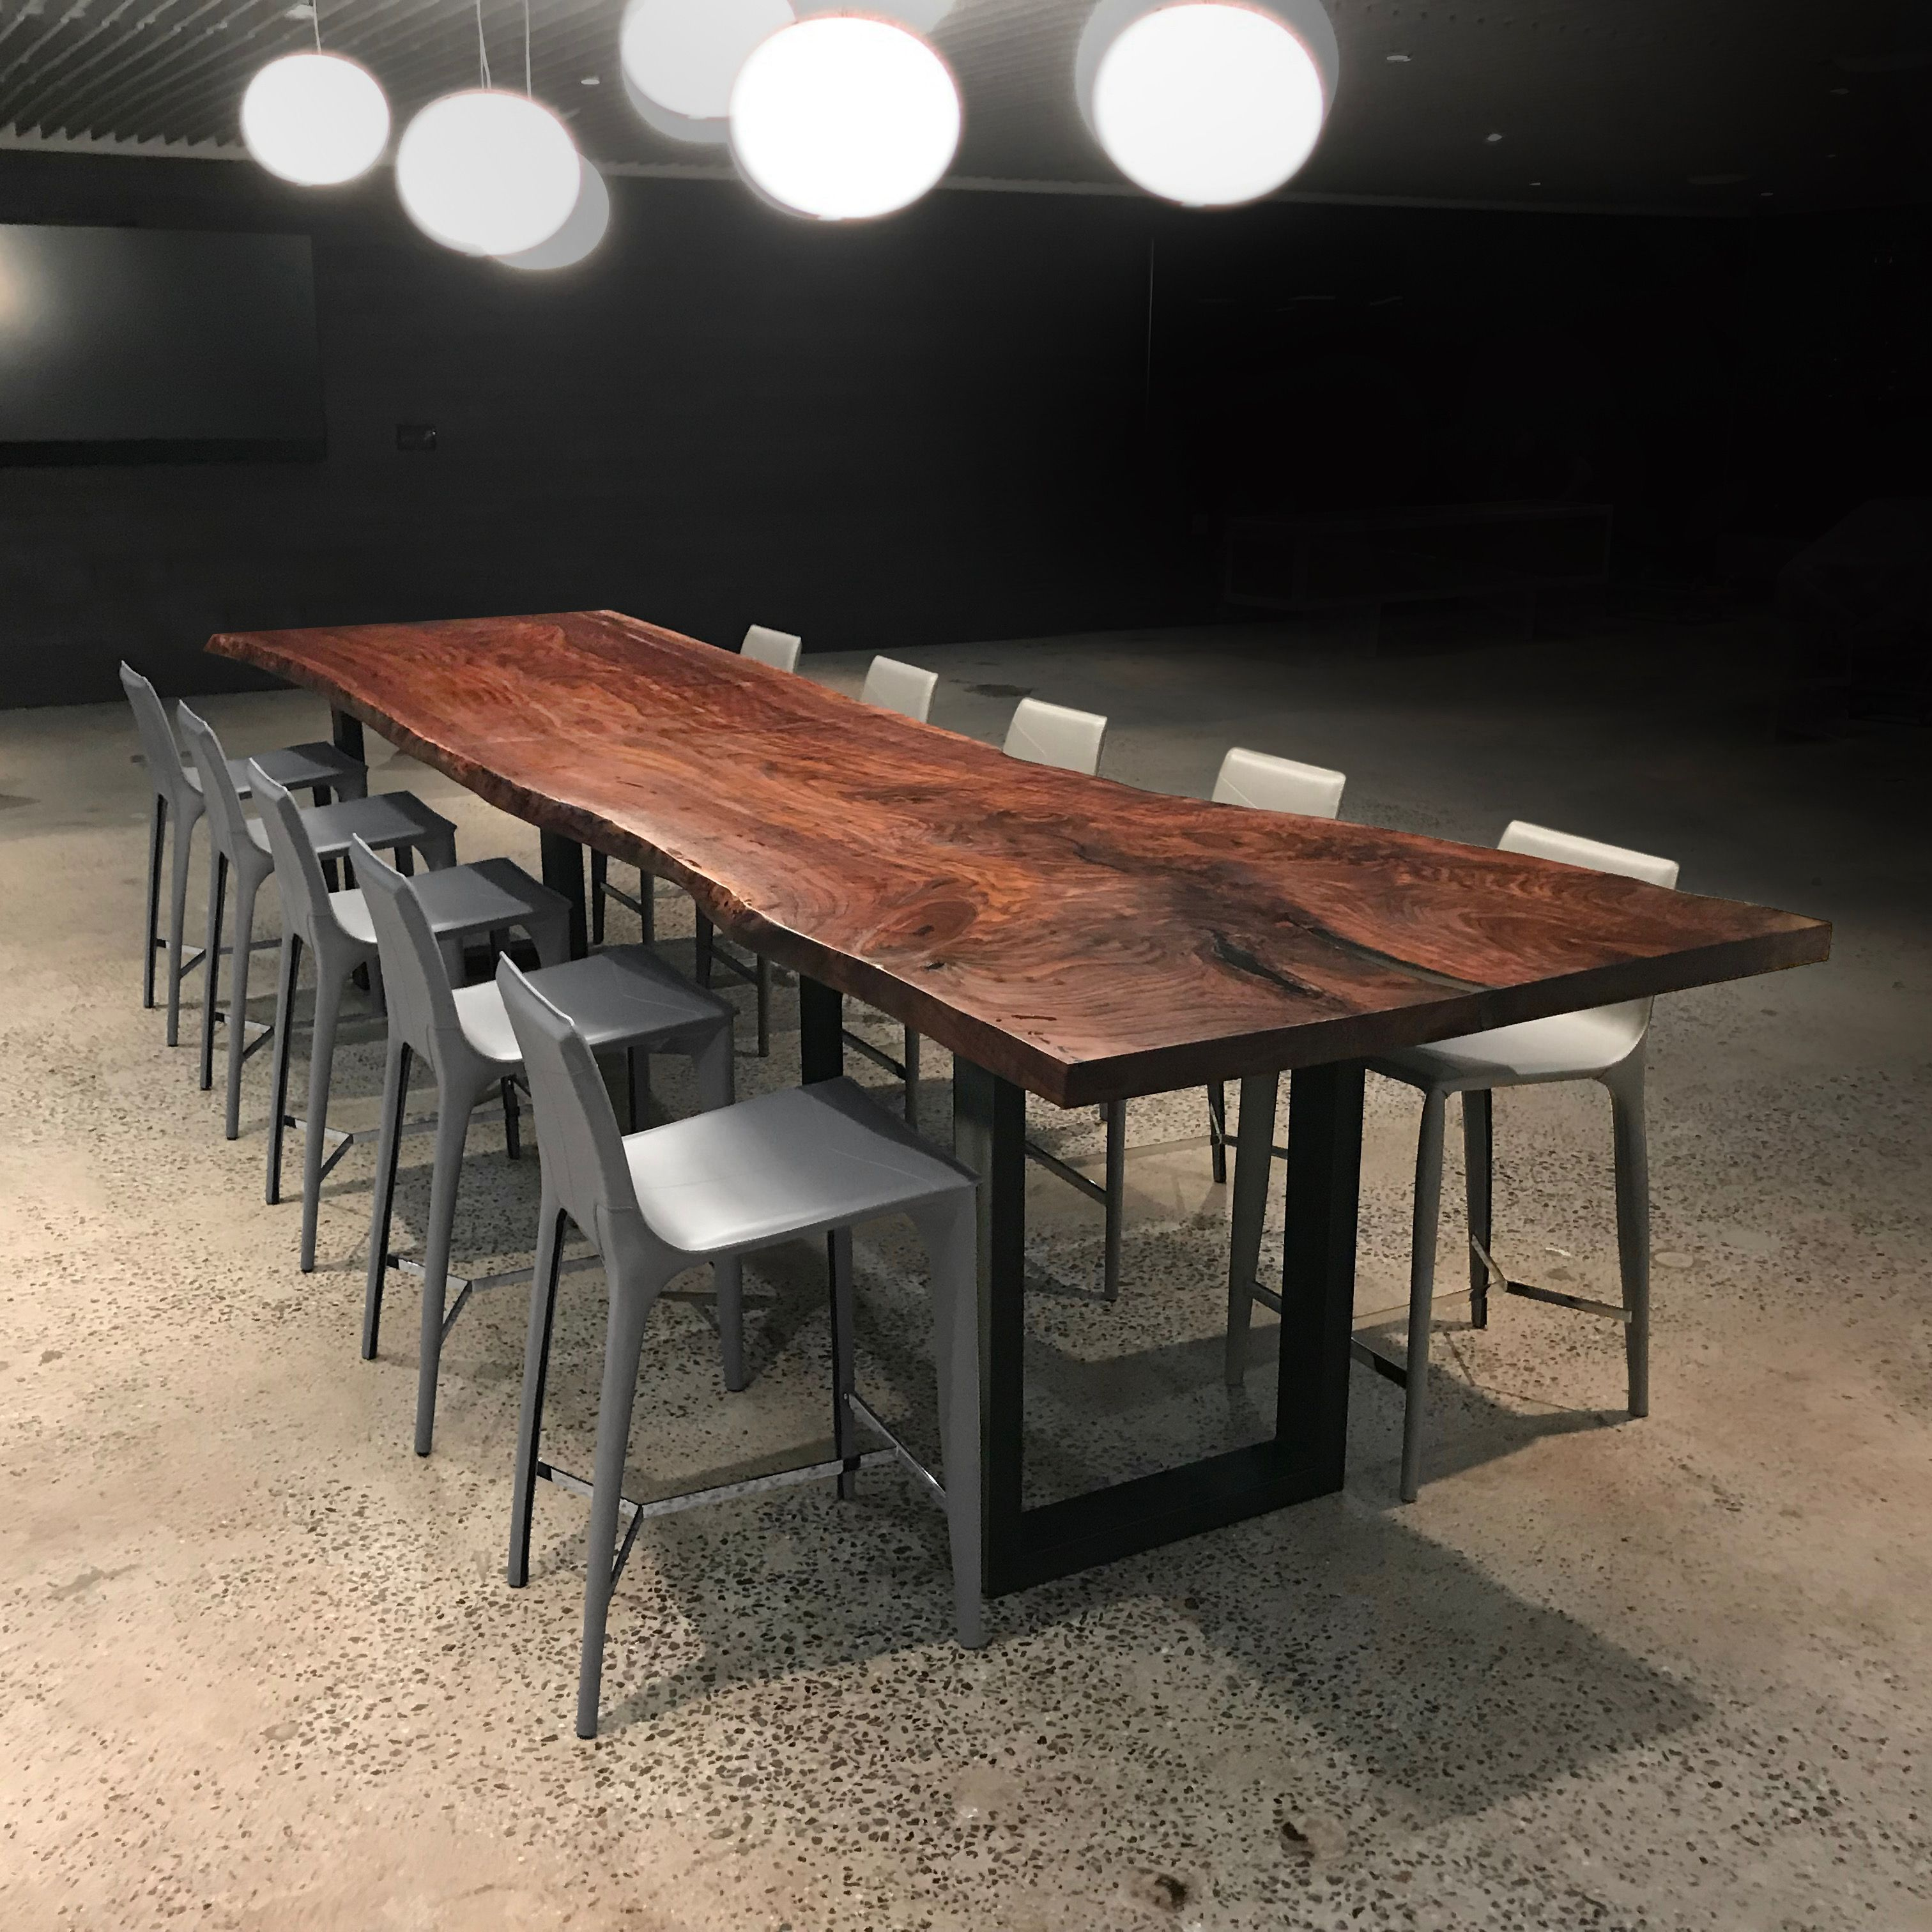 3ed43a4f9b8744a5deccf5be20e53b63 Incroyable De Table Basse Le Corbusier Concept